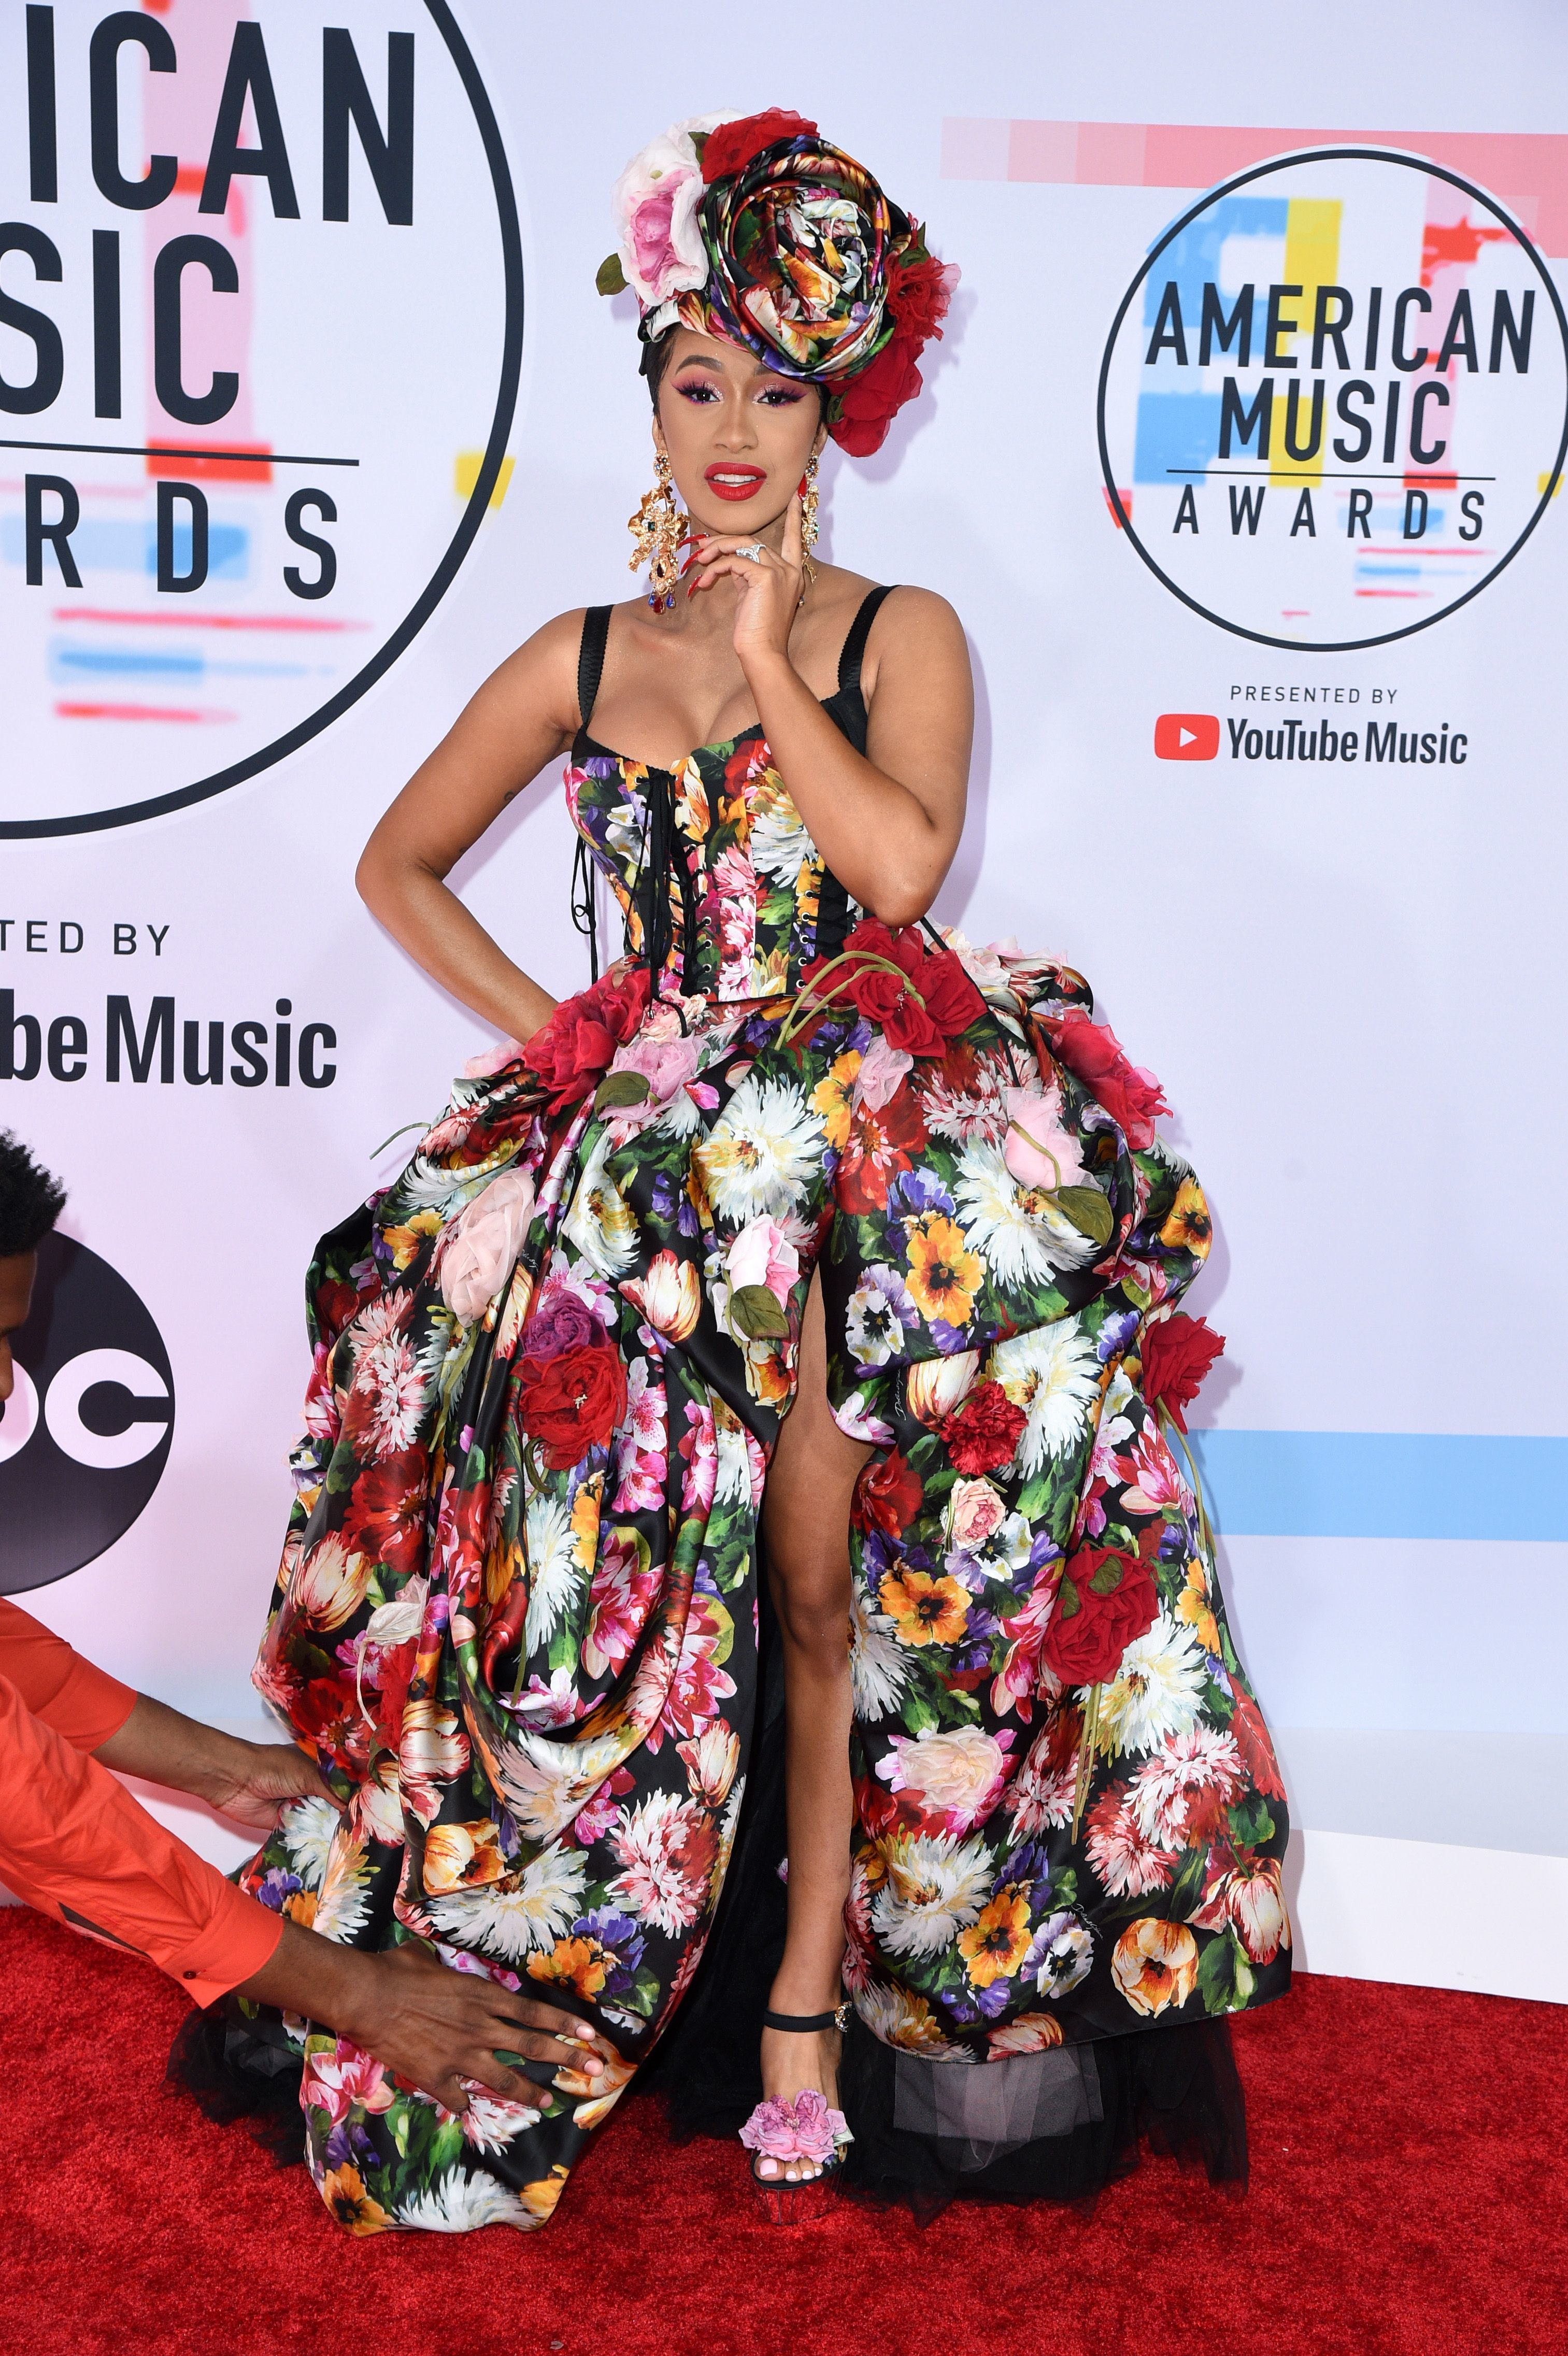 2019 Grammy Awards Nominees